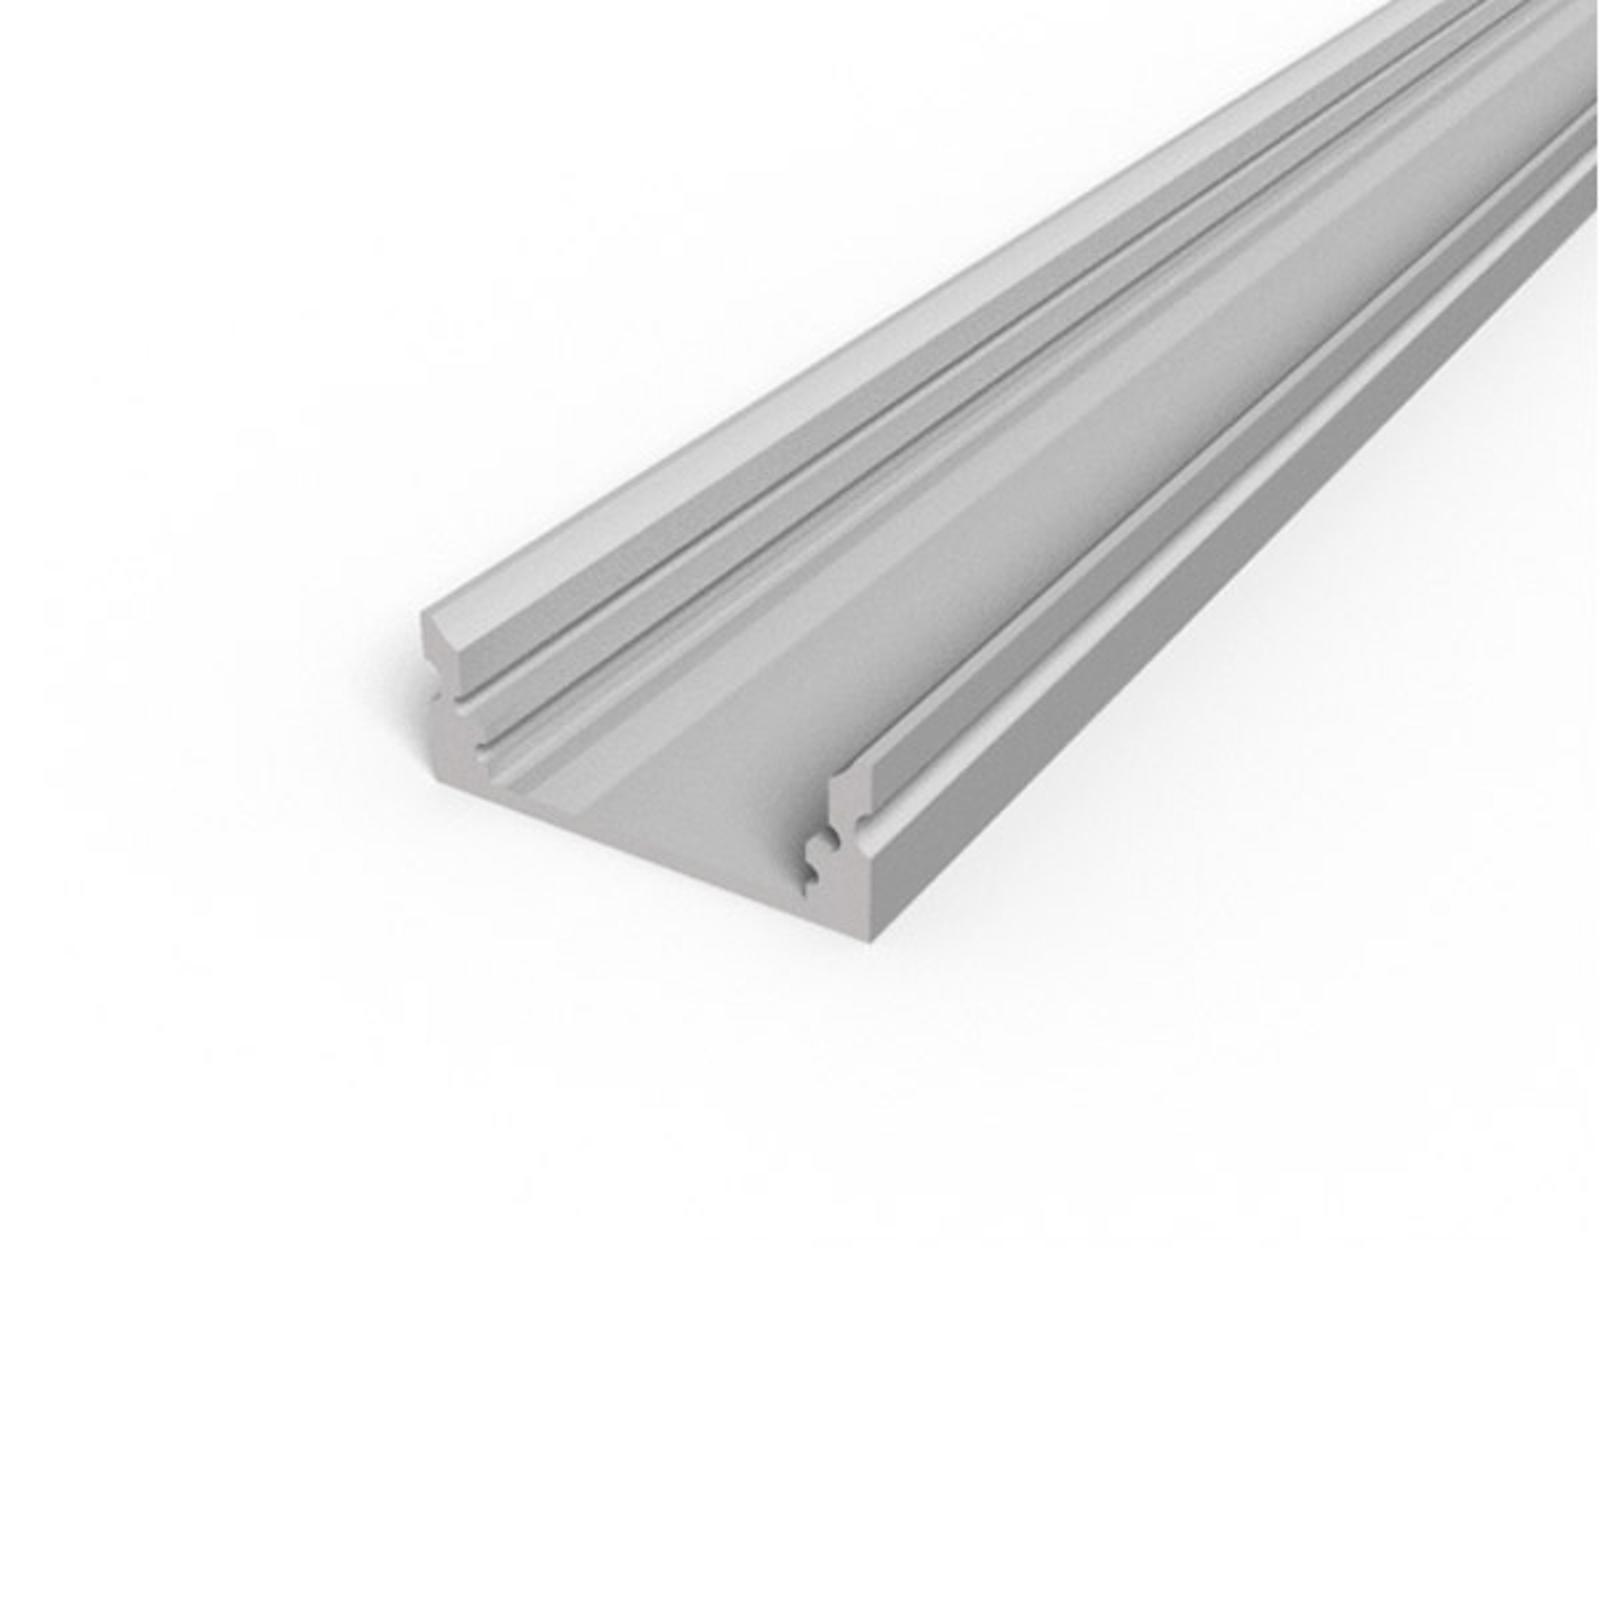 BRUMBERG Anbau-Aluminiumprofil-Set für LED-Strips